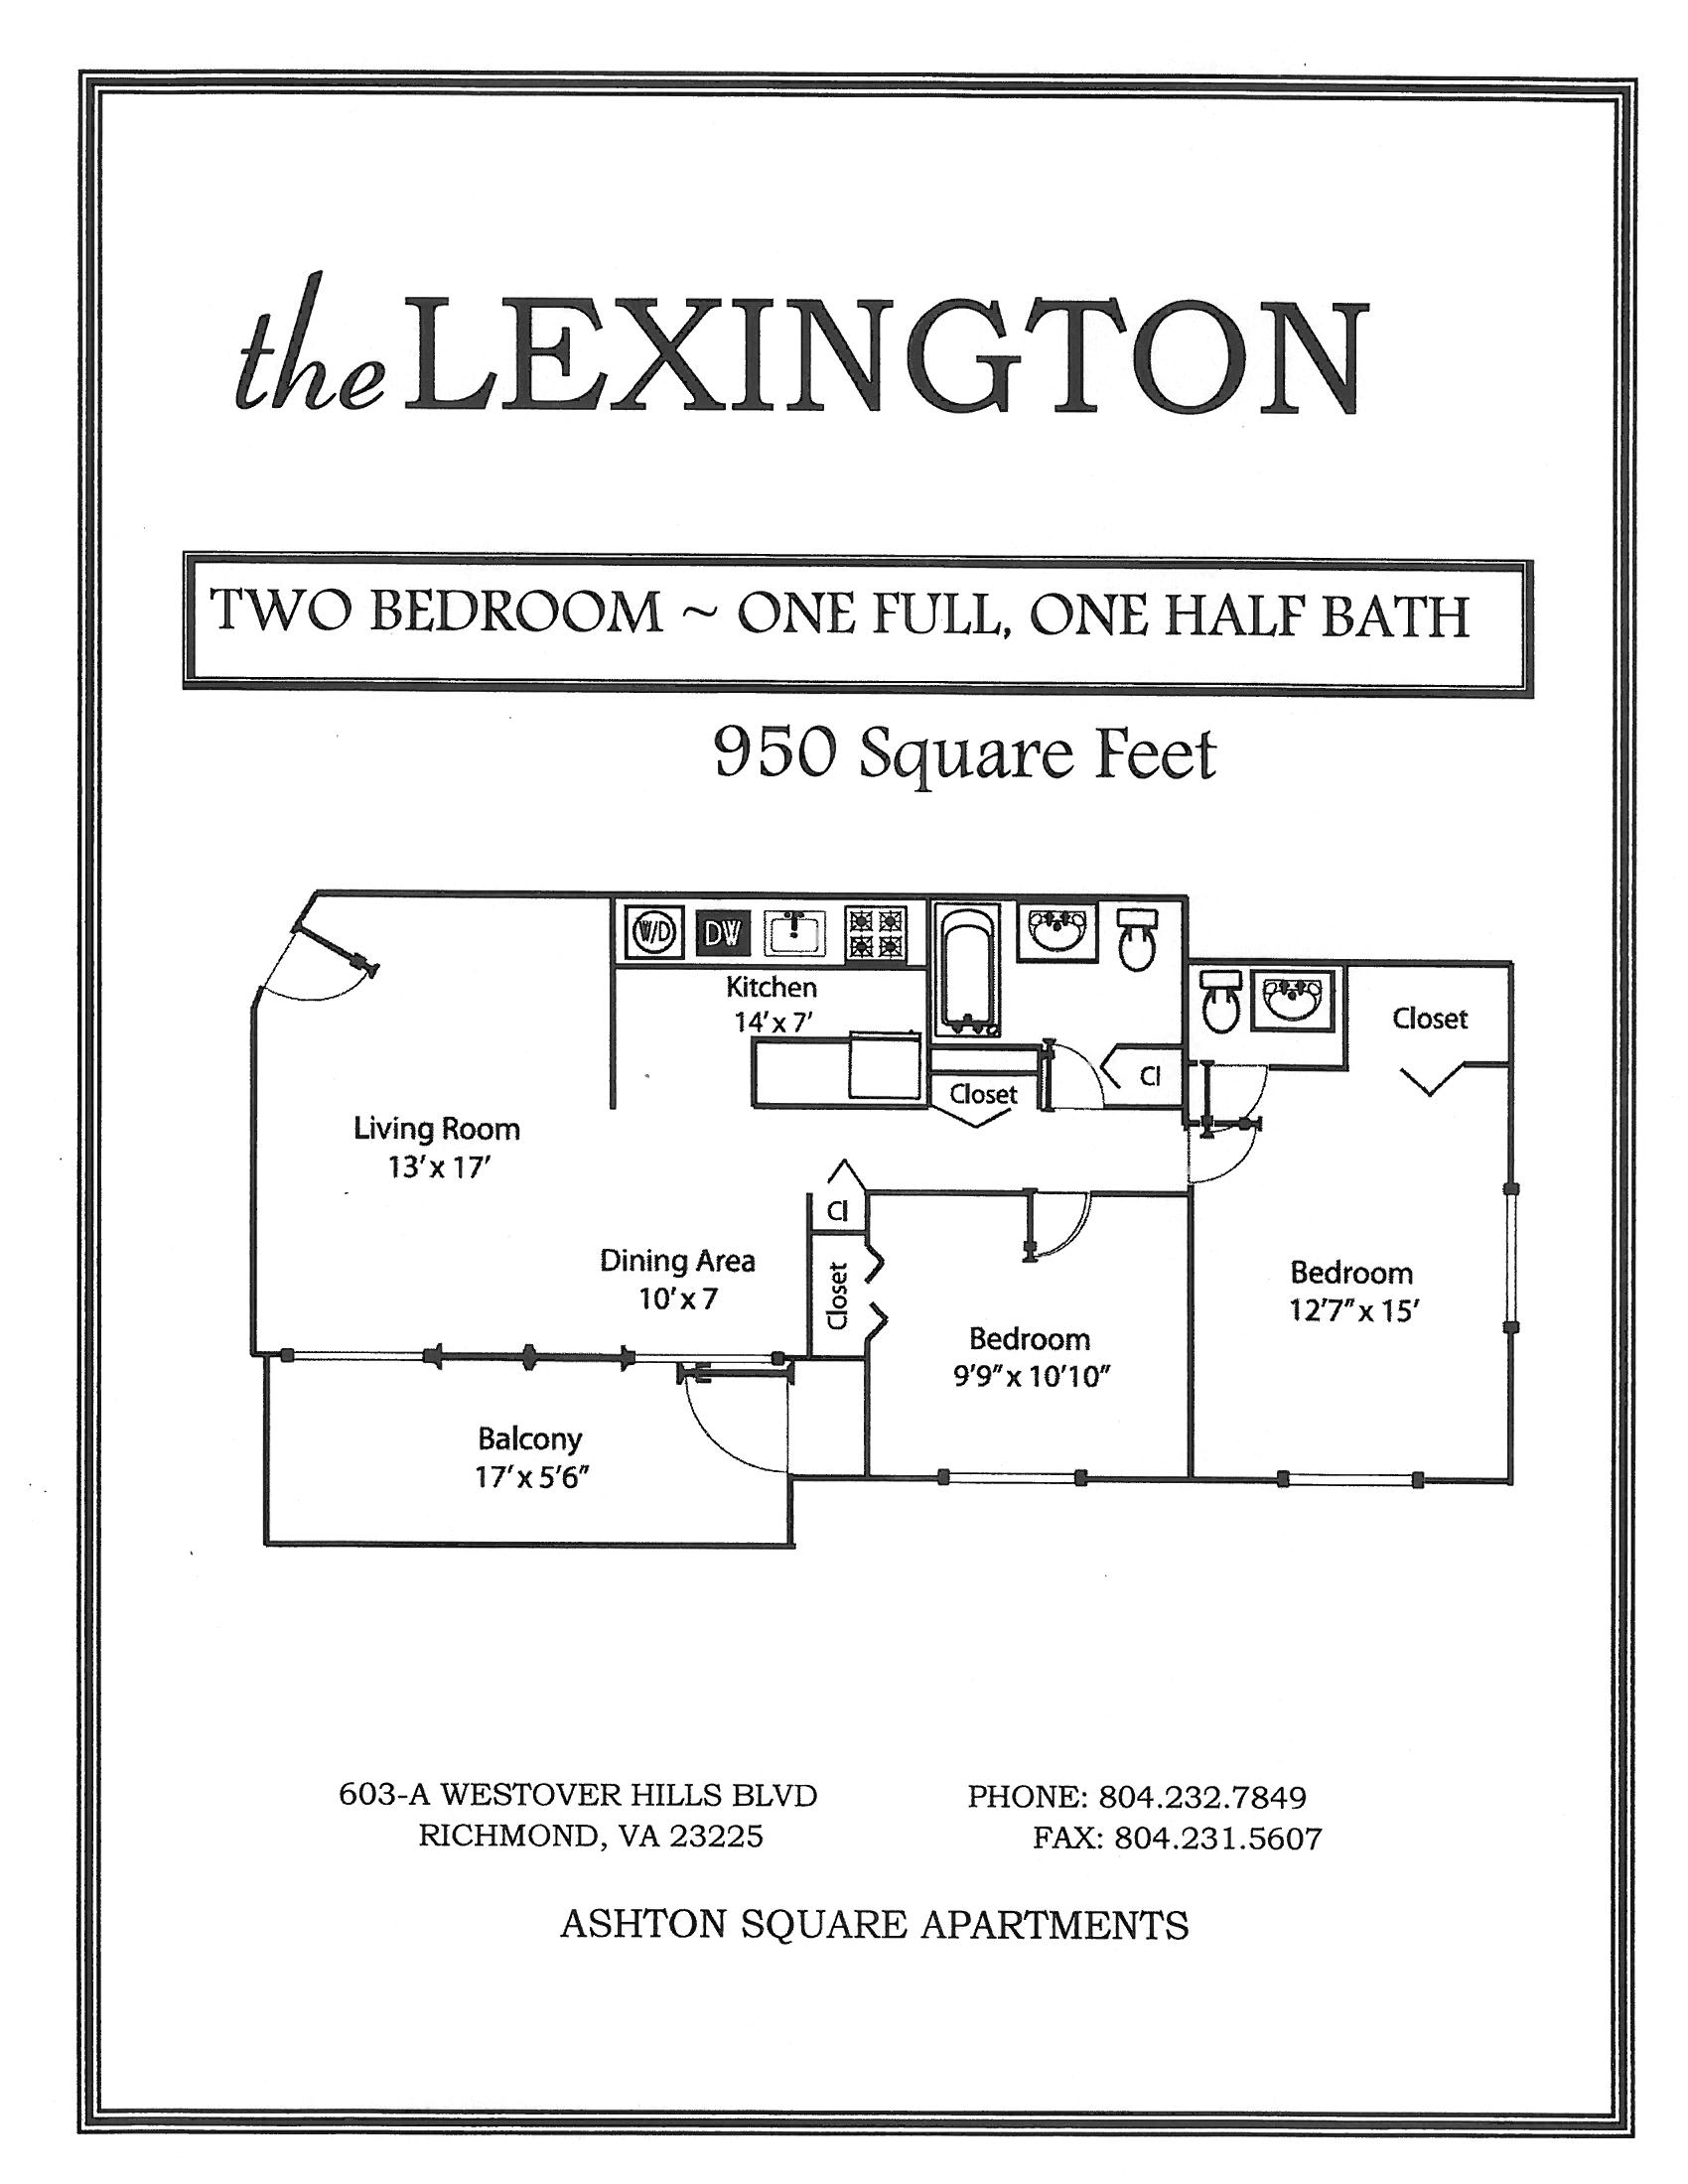 Lexington Two Bedroom One Half Bath Floor Plan at Ashton Square Apartments